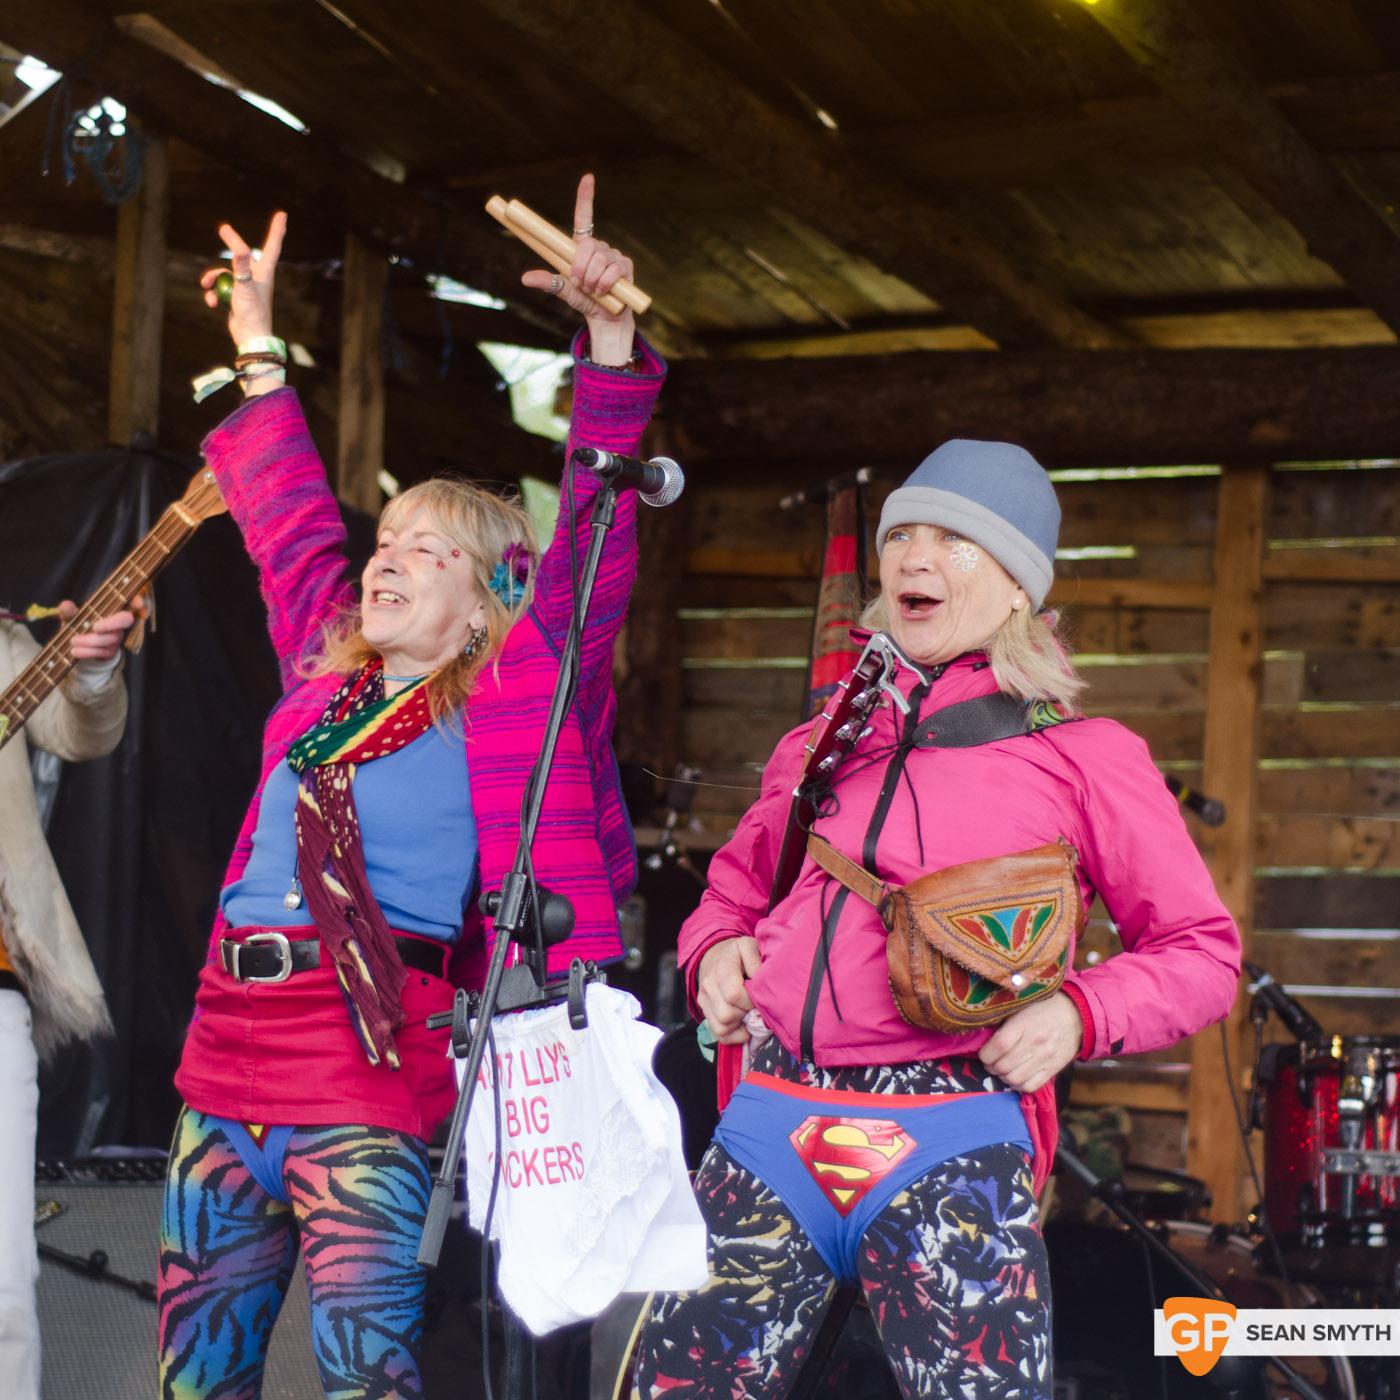 the-twisted-sisters-saturday-at-vantastival-by-sean-smyth-1-5-14-15-of-45